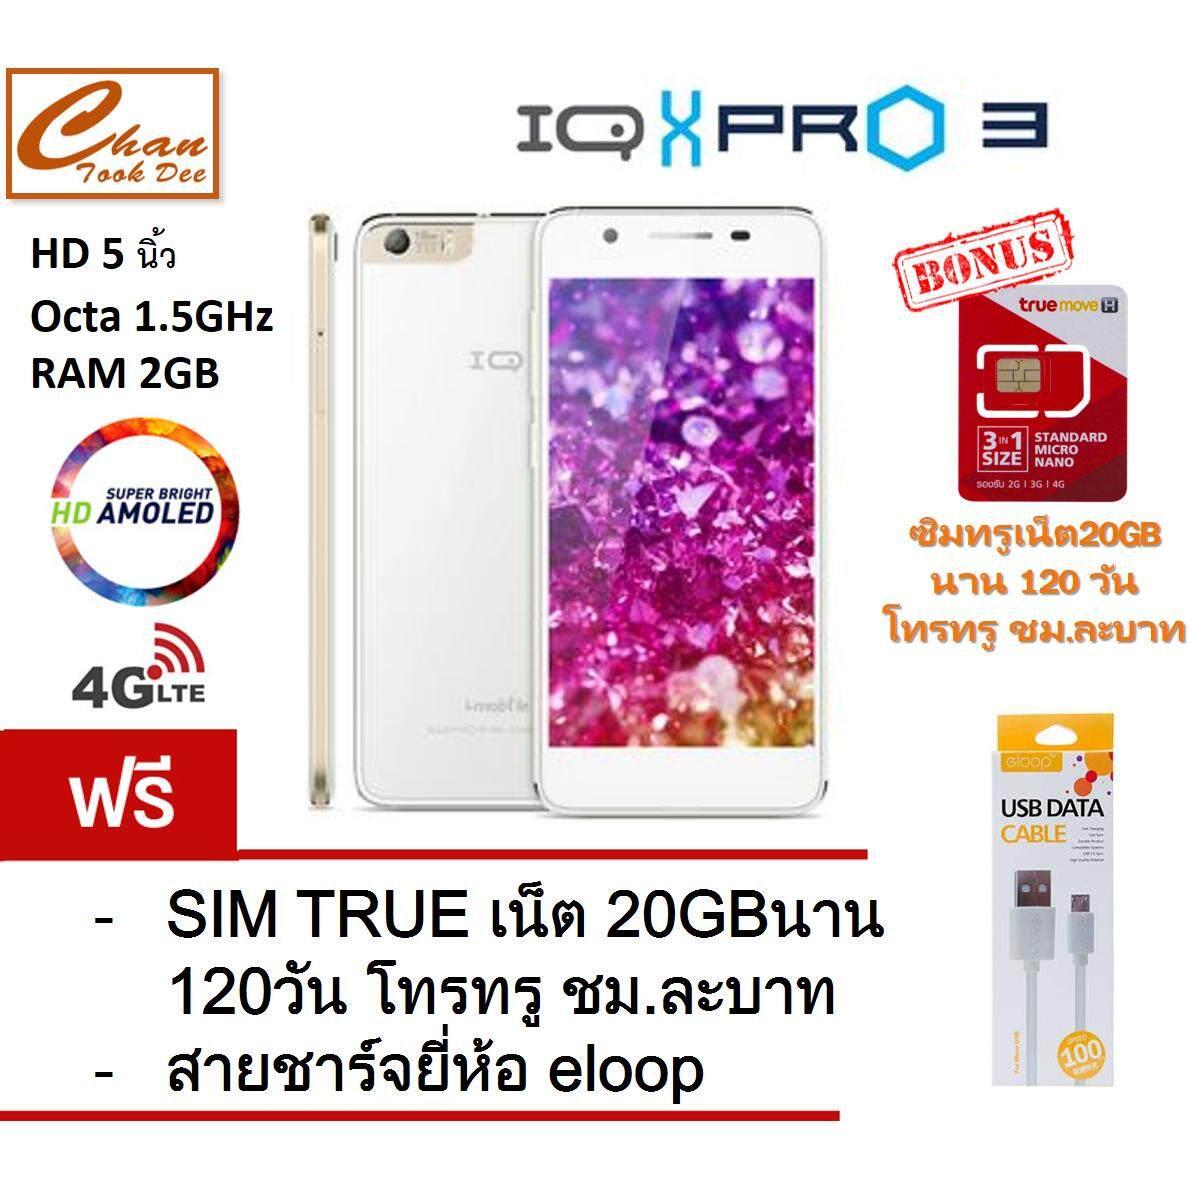 I-mobile IQ X PRO3 Super Brighr AMOLED HD 5 นิ้ว  4GLTE (GOLD) ประกันศูนย์  ฟรี สายชาร์จ ยี่ห้อ eloop  +  ซิมทรูเน็ต20GB  นาน 120 วัน โทรทรู ชม.ละบาท